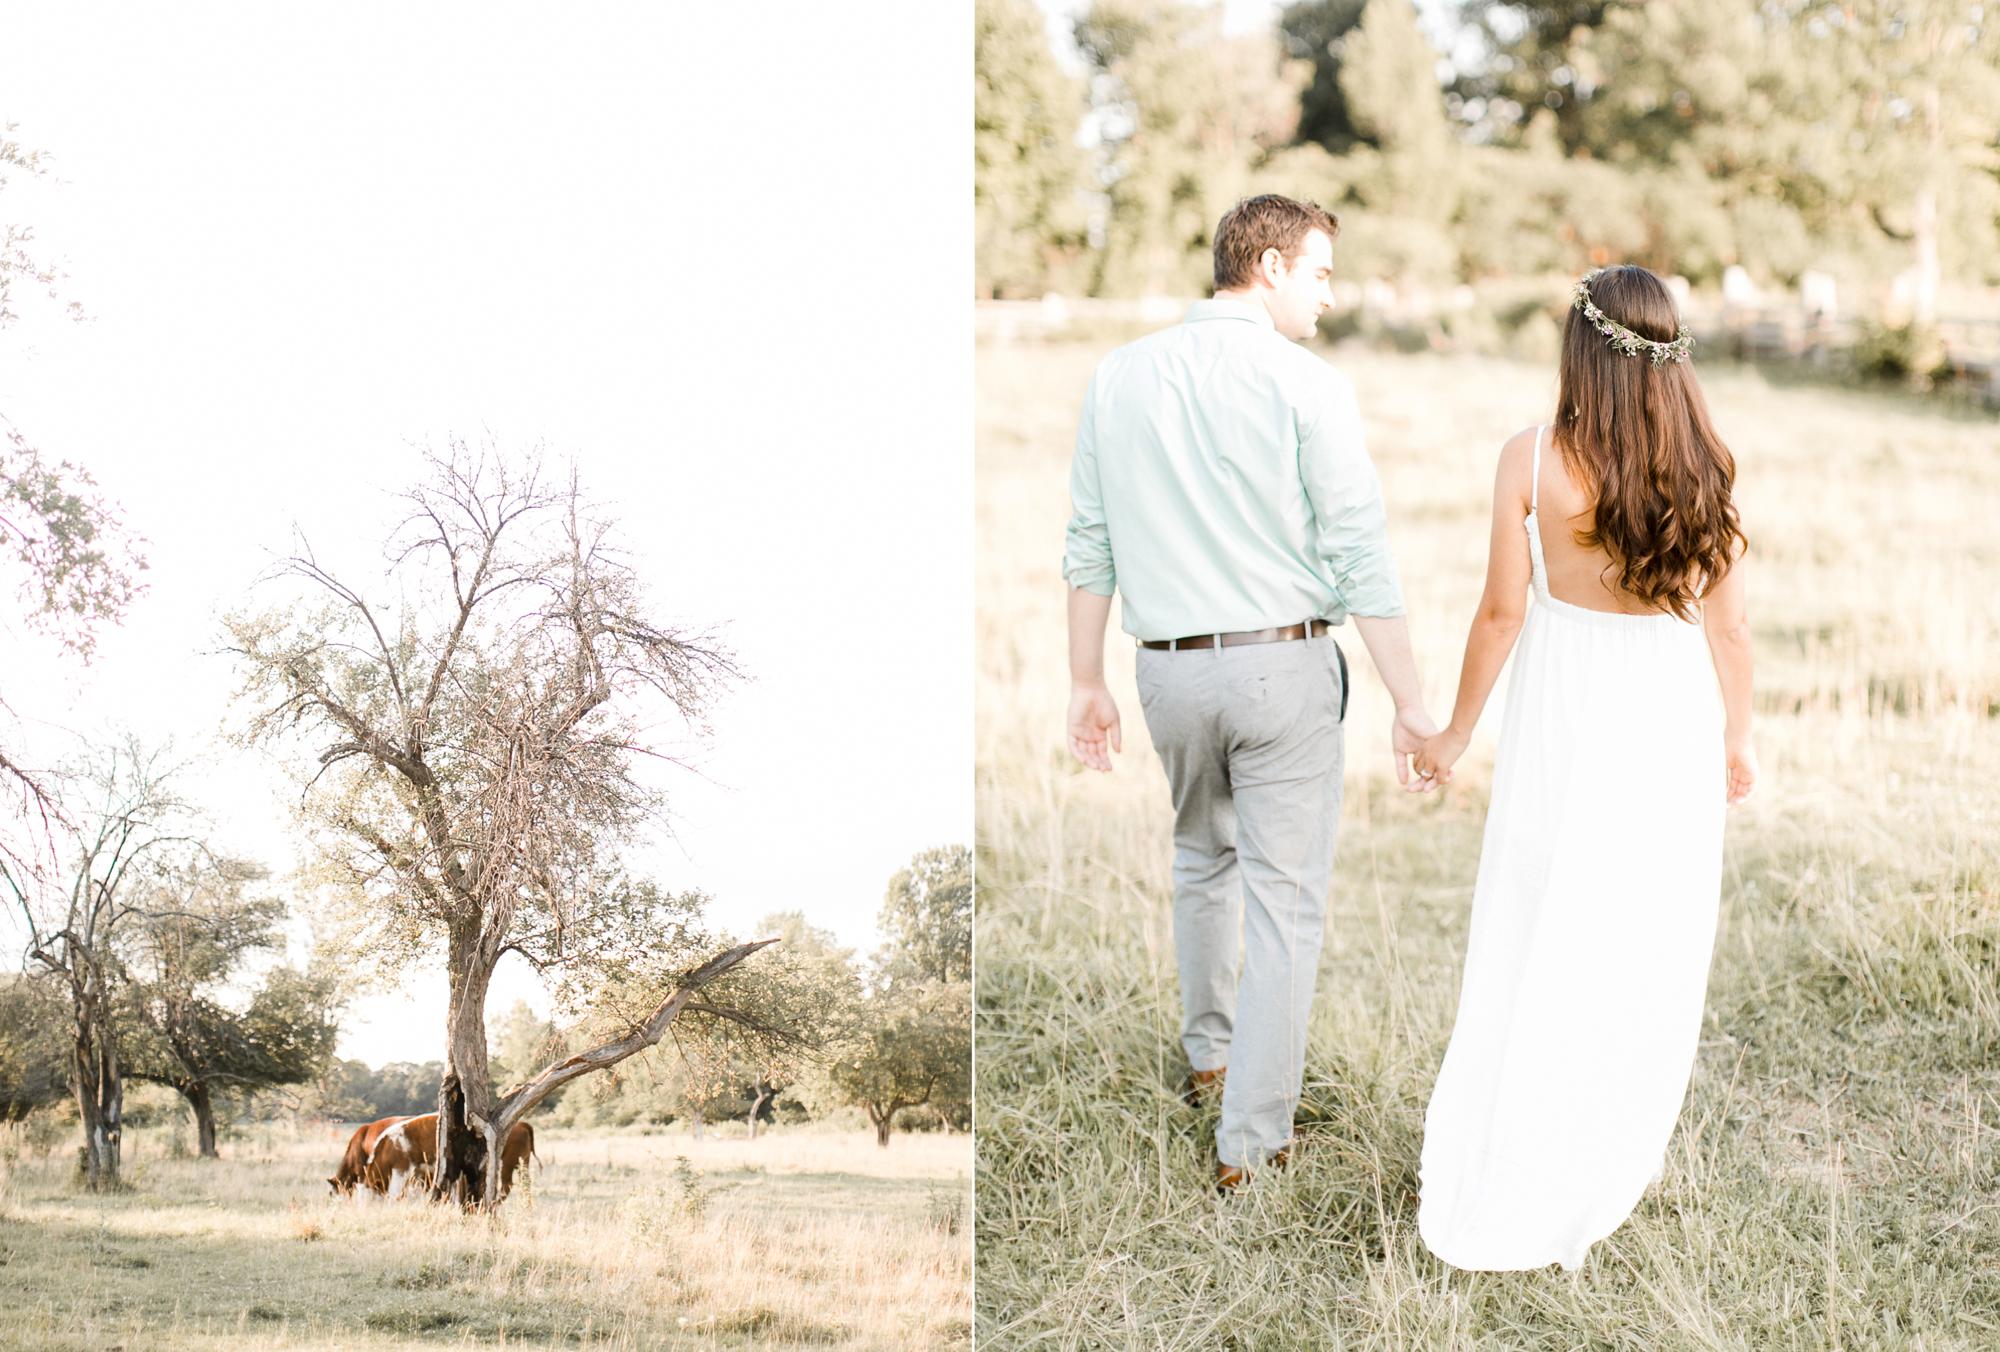 Chris&Marianne-Engagement-39.jpg